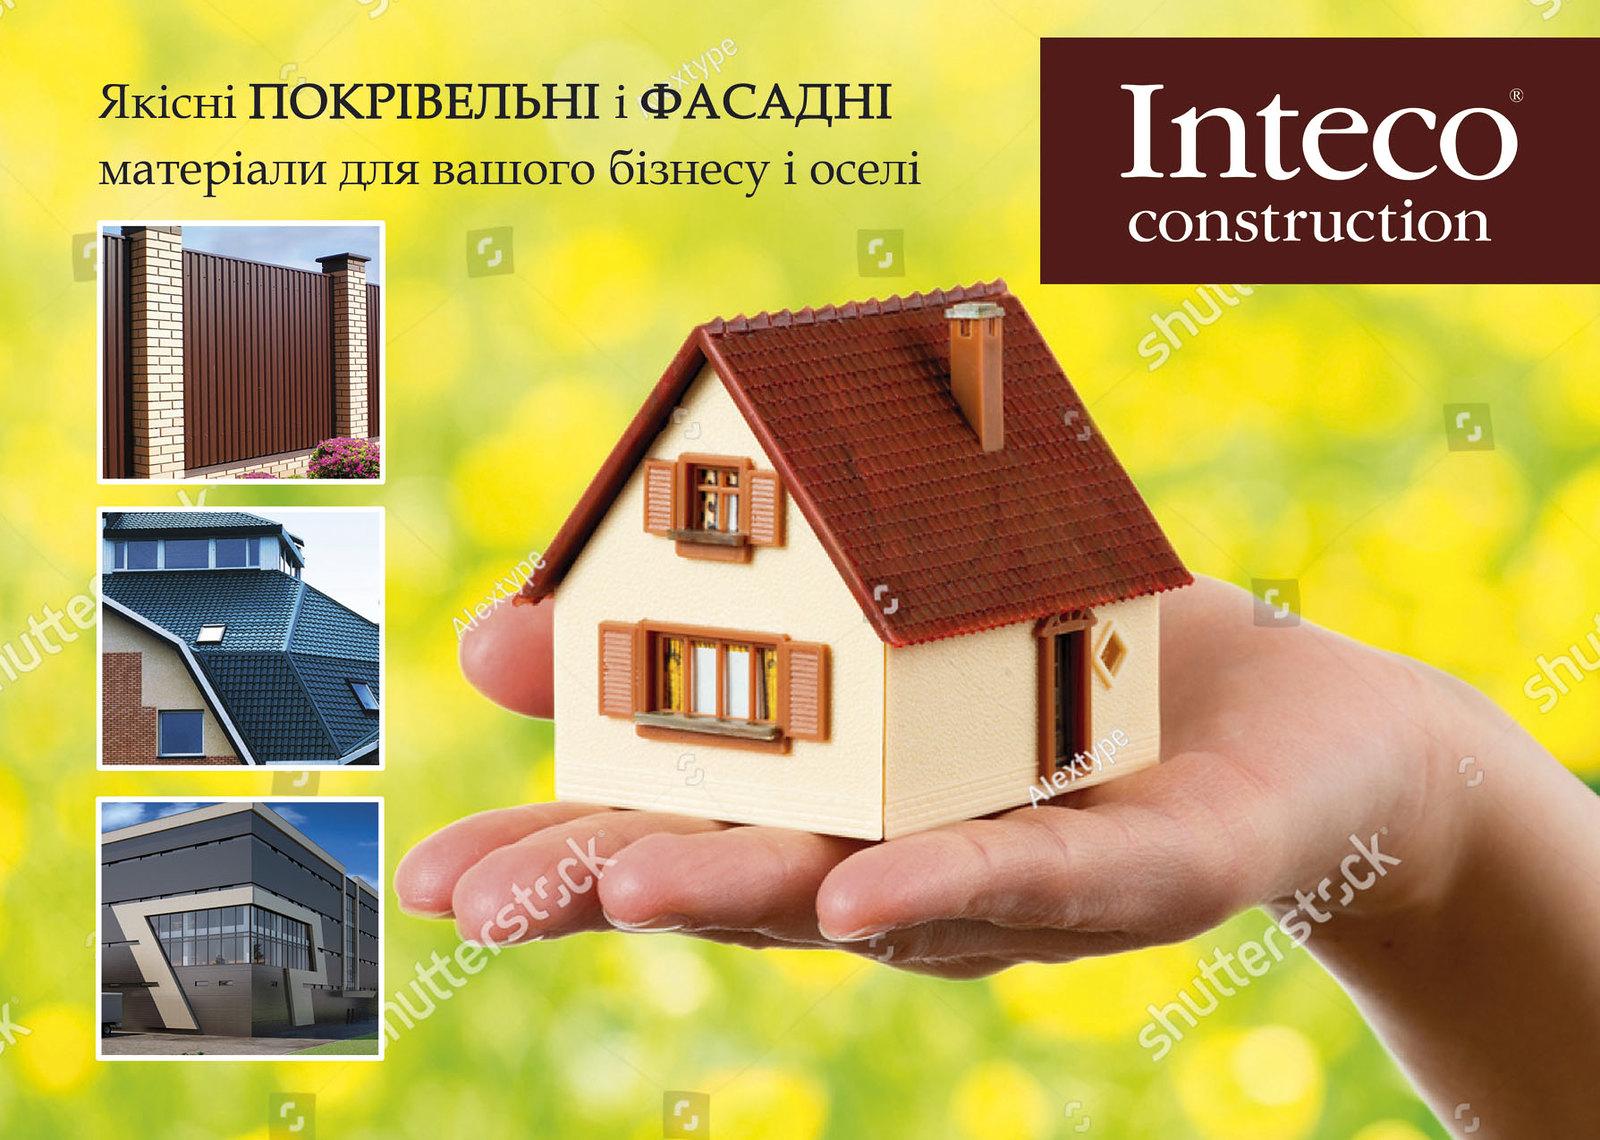 (01) Kalend Inteco 01 verh 03